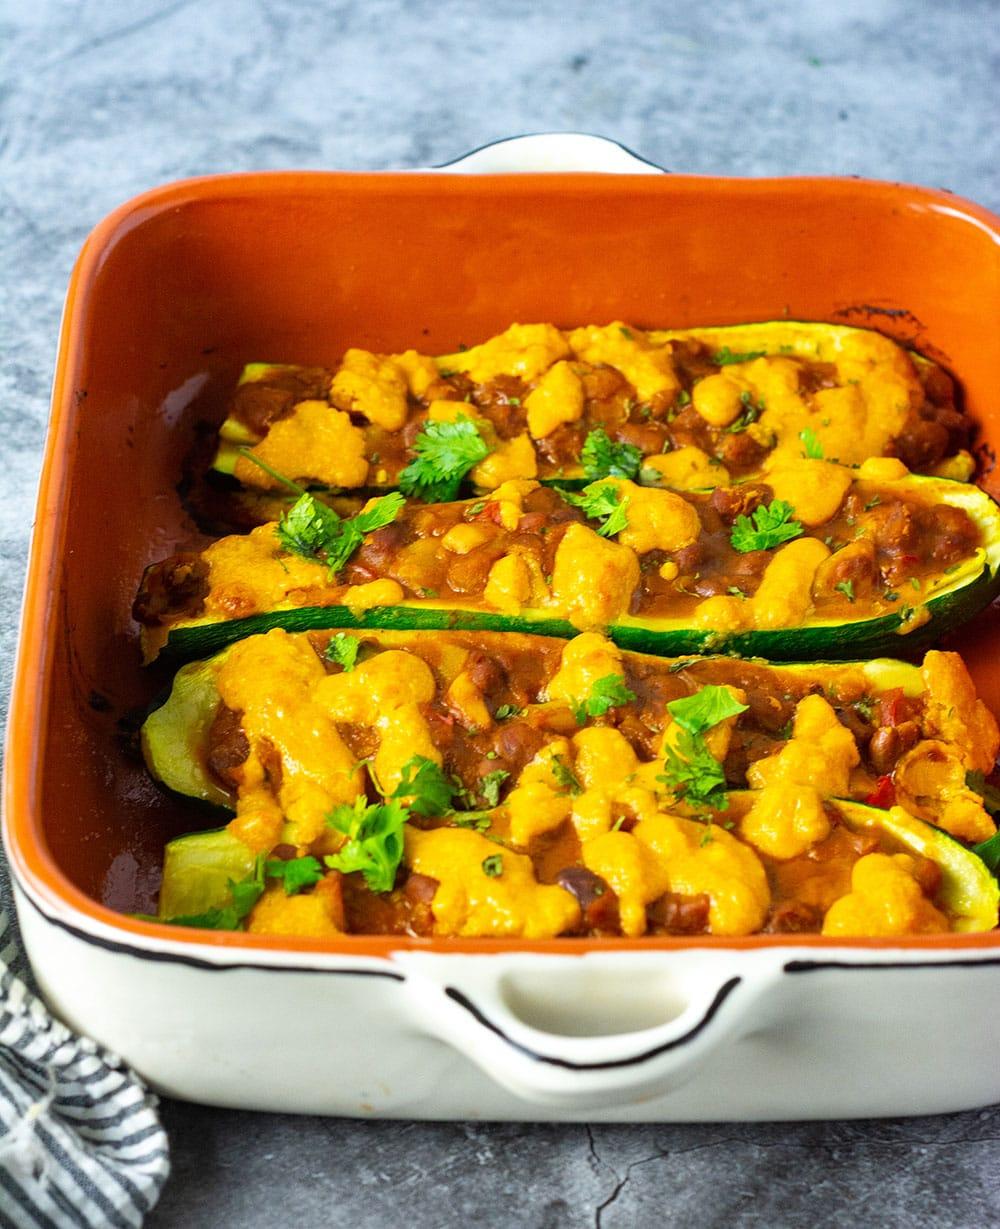 Straight on view of egan zucchini boatss in an orange casserole dish,zucchini boats stuffed with seasoned pinto beans, vegan cheese sauce